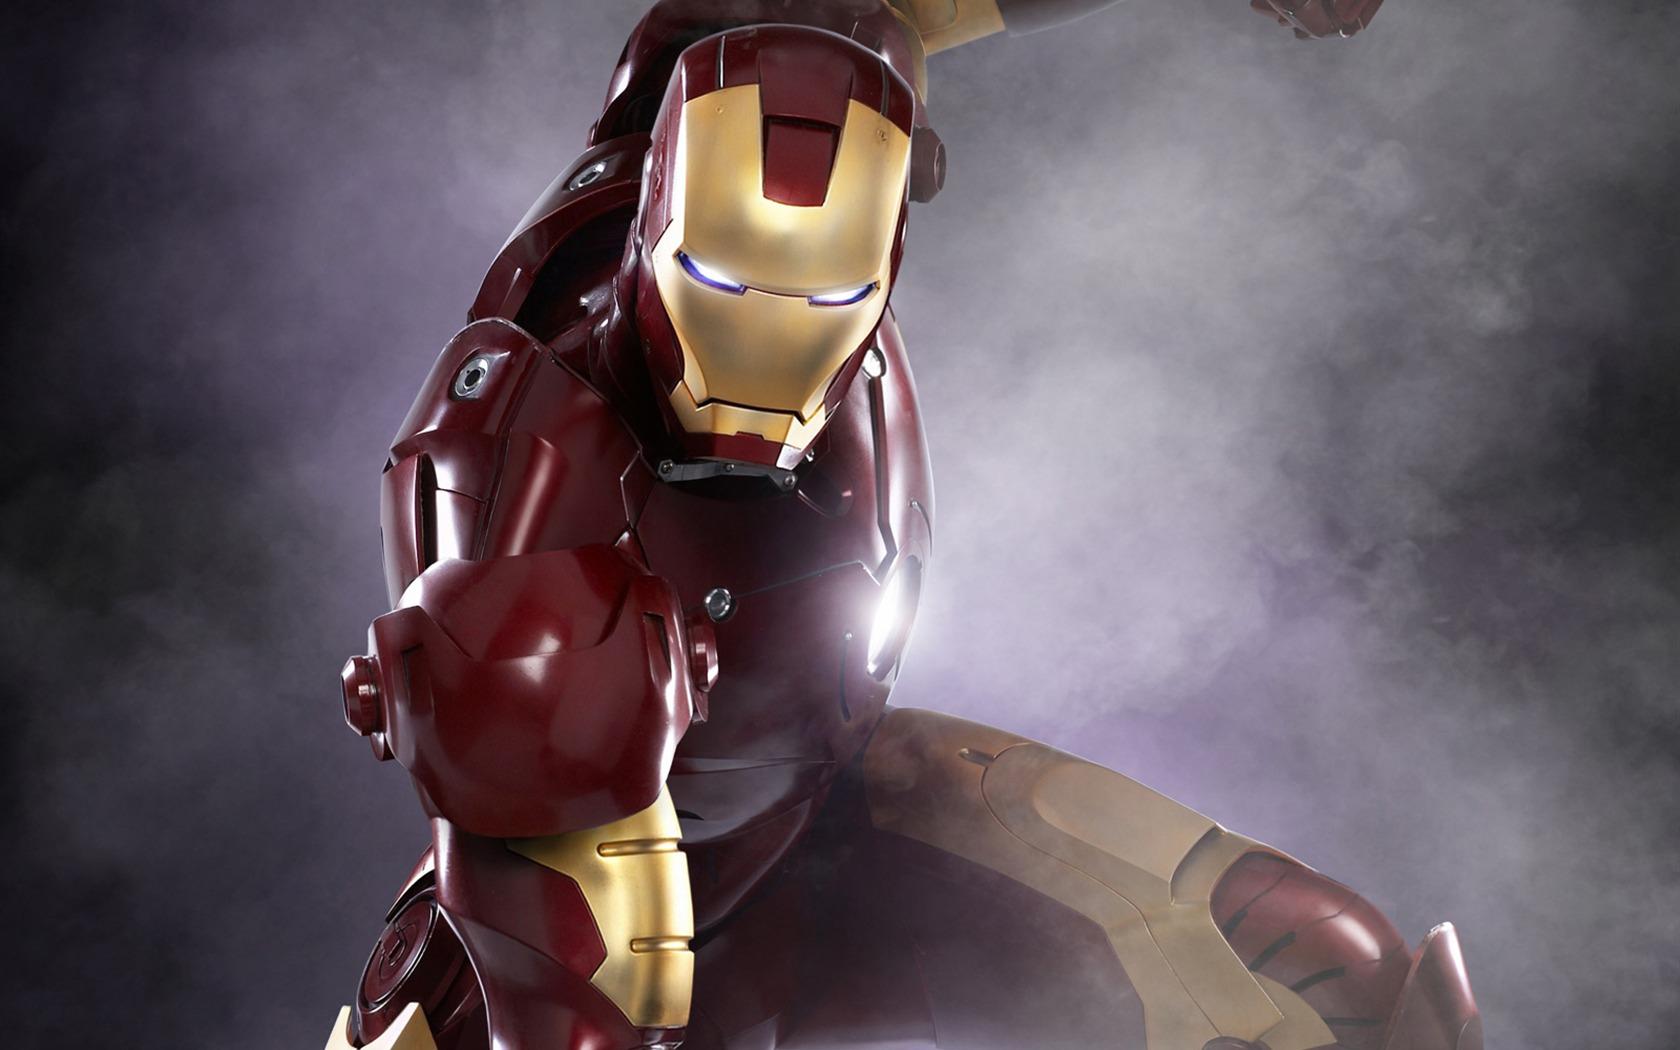 2013 iron man 3 movie hd desktop wallpaper 06 preview   10wallpaper